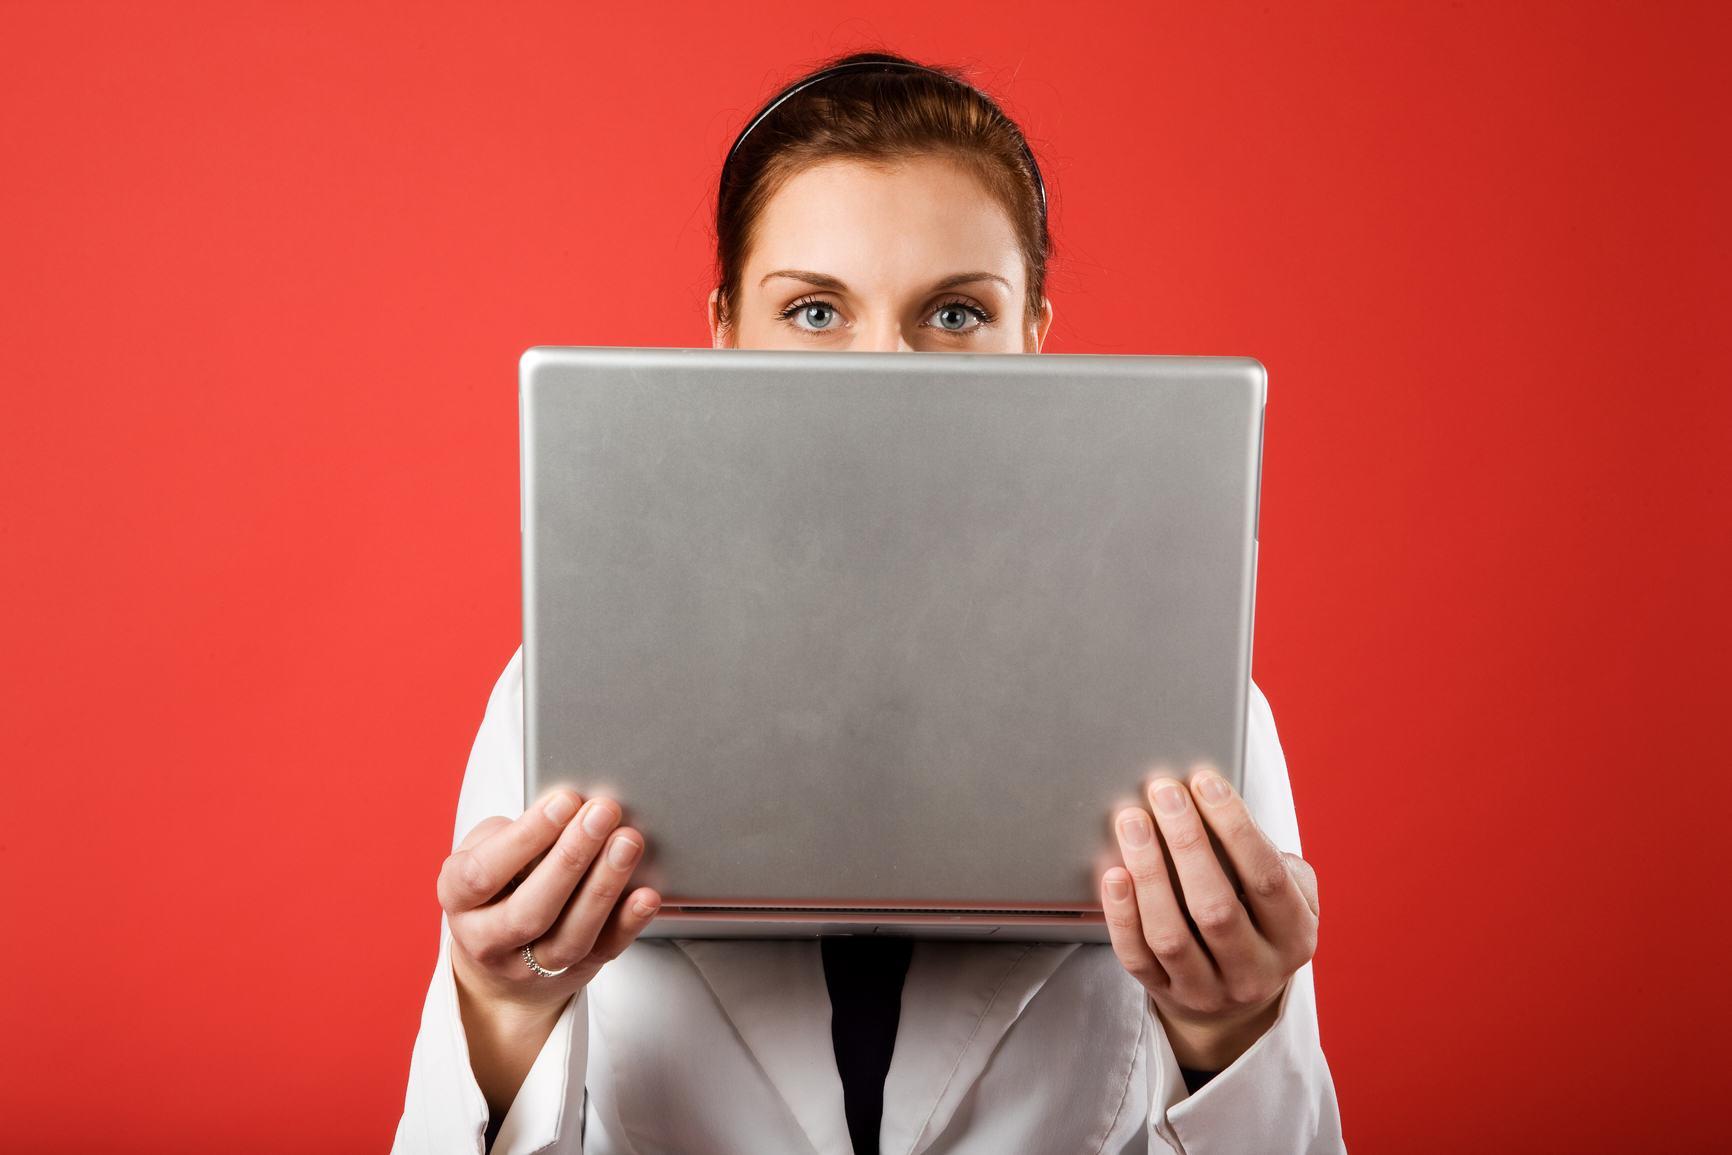 regulamin apteki internetowej,regulamin serwisu, regulamin portalu, regulamin strony